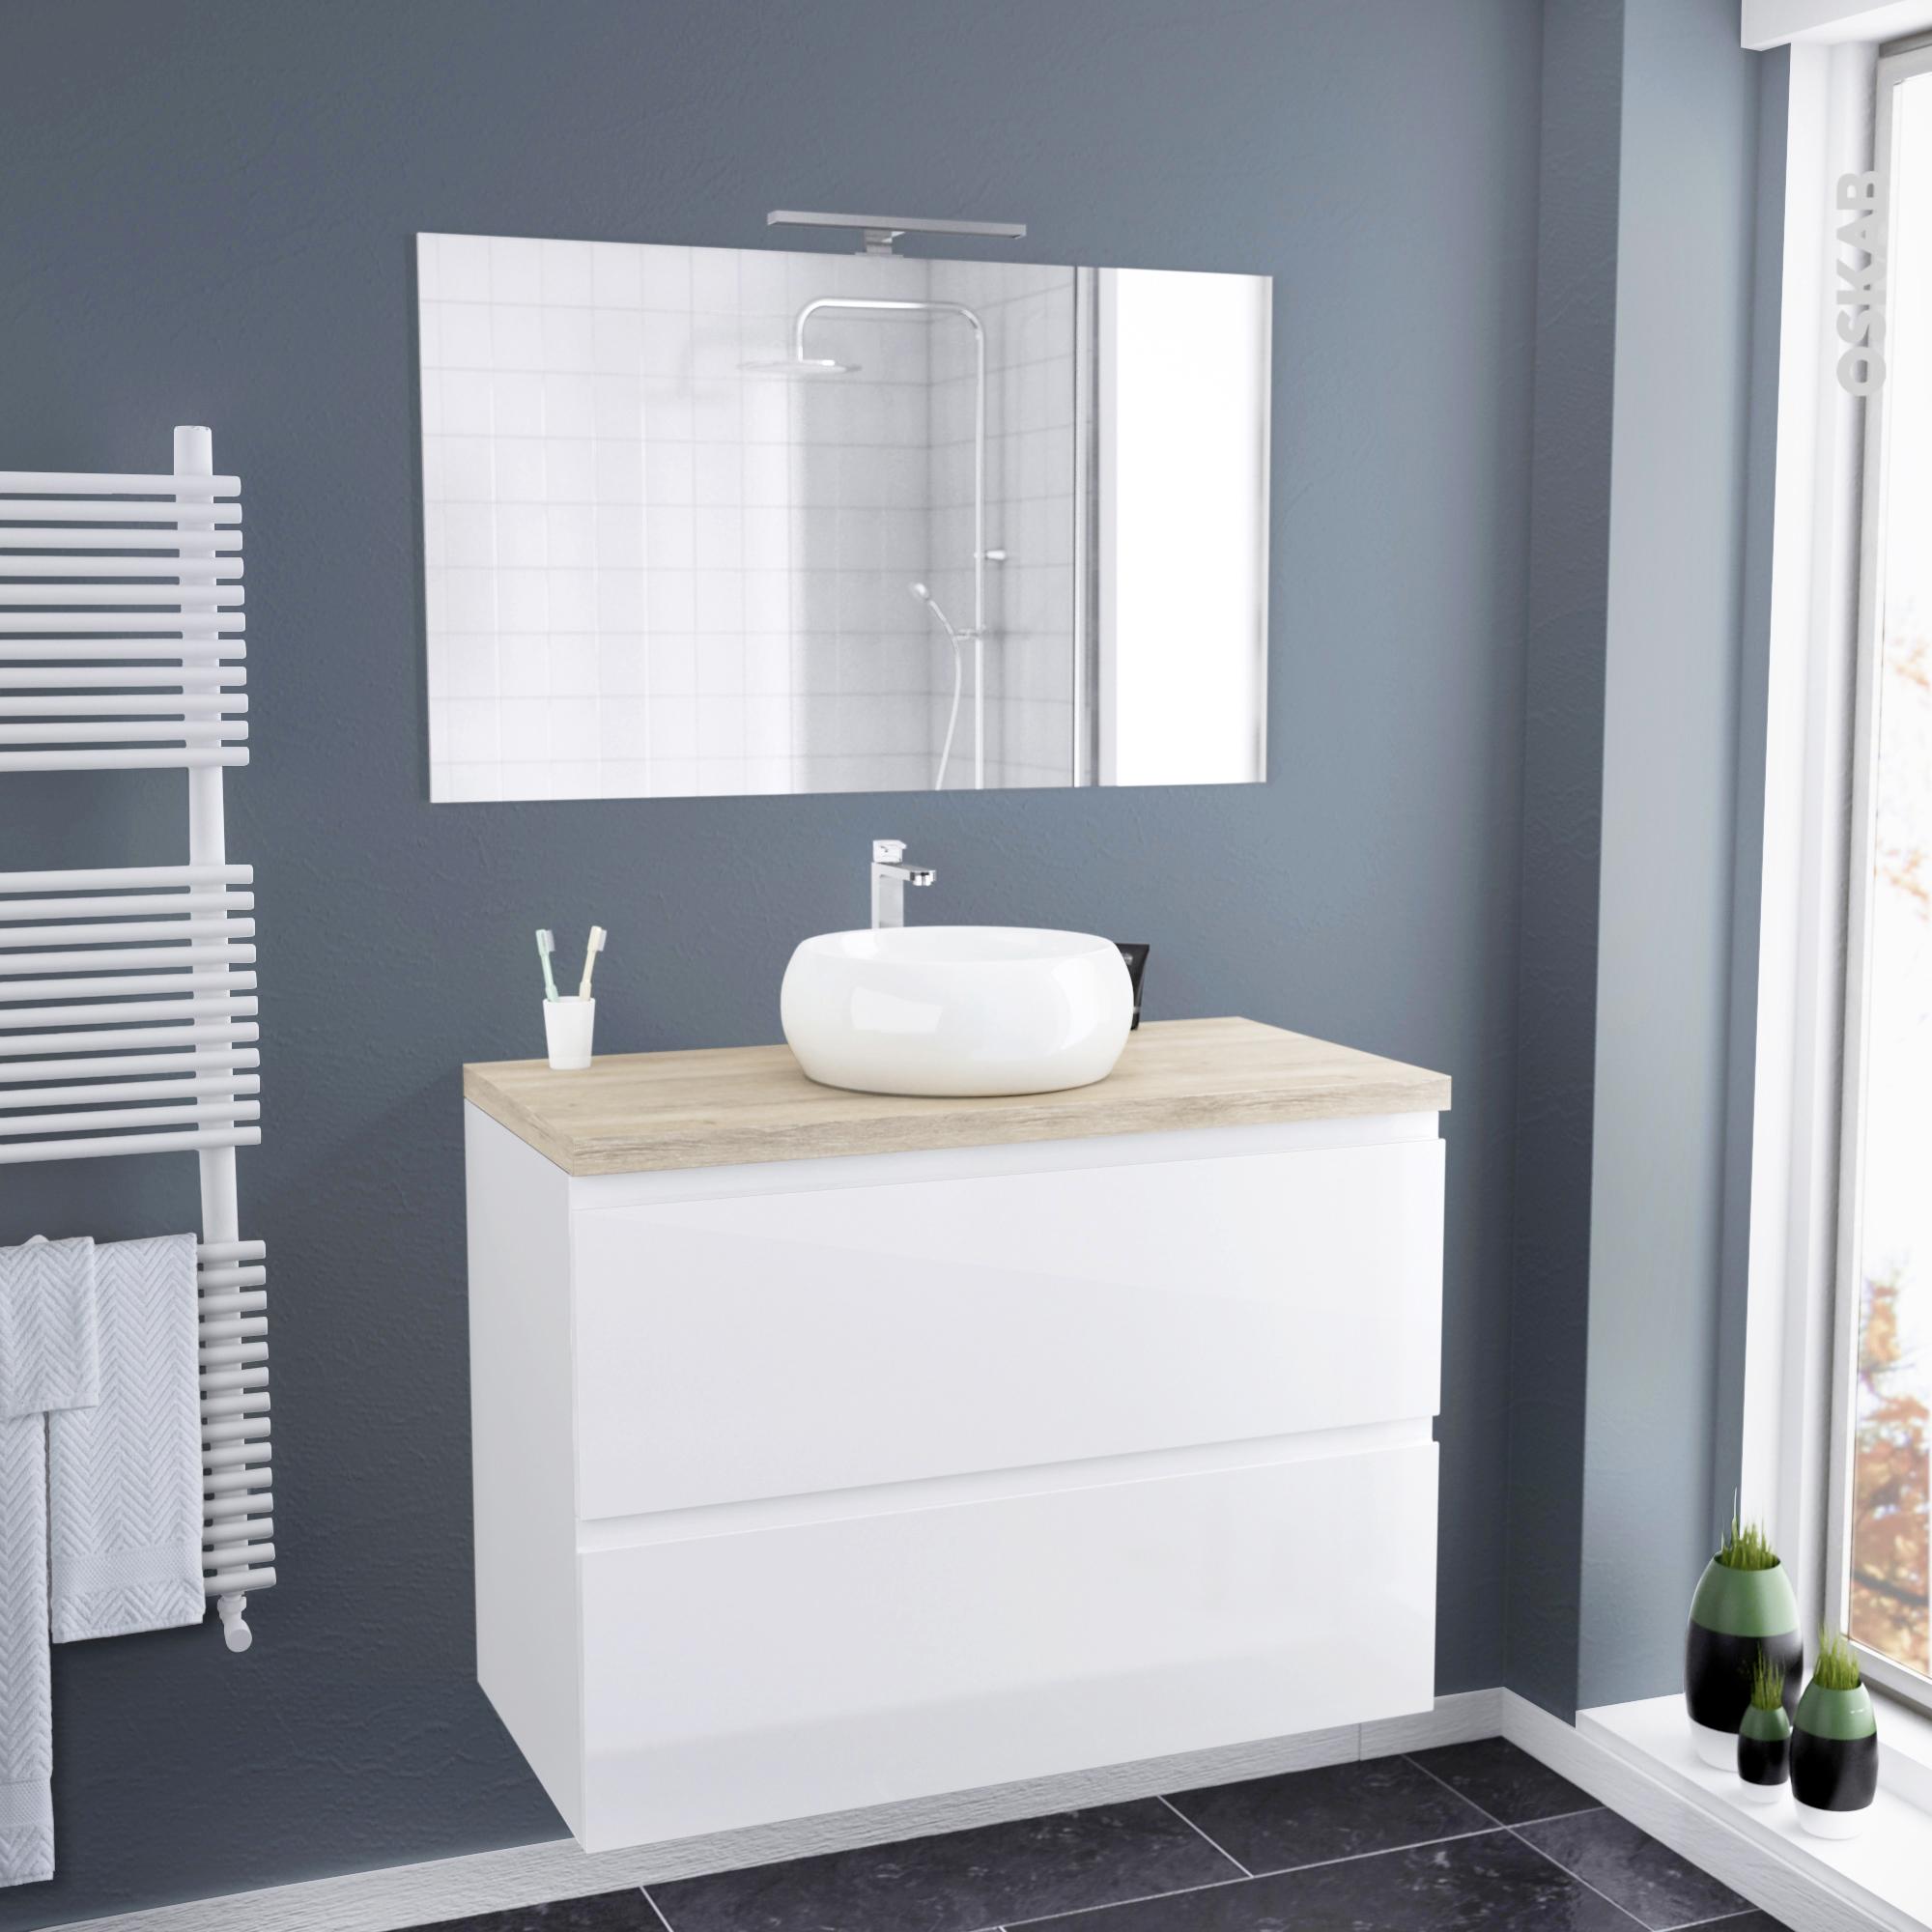 ensemble salle de bains meuble ipoma blanc plan de toilette hosta